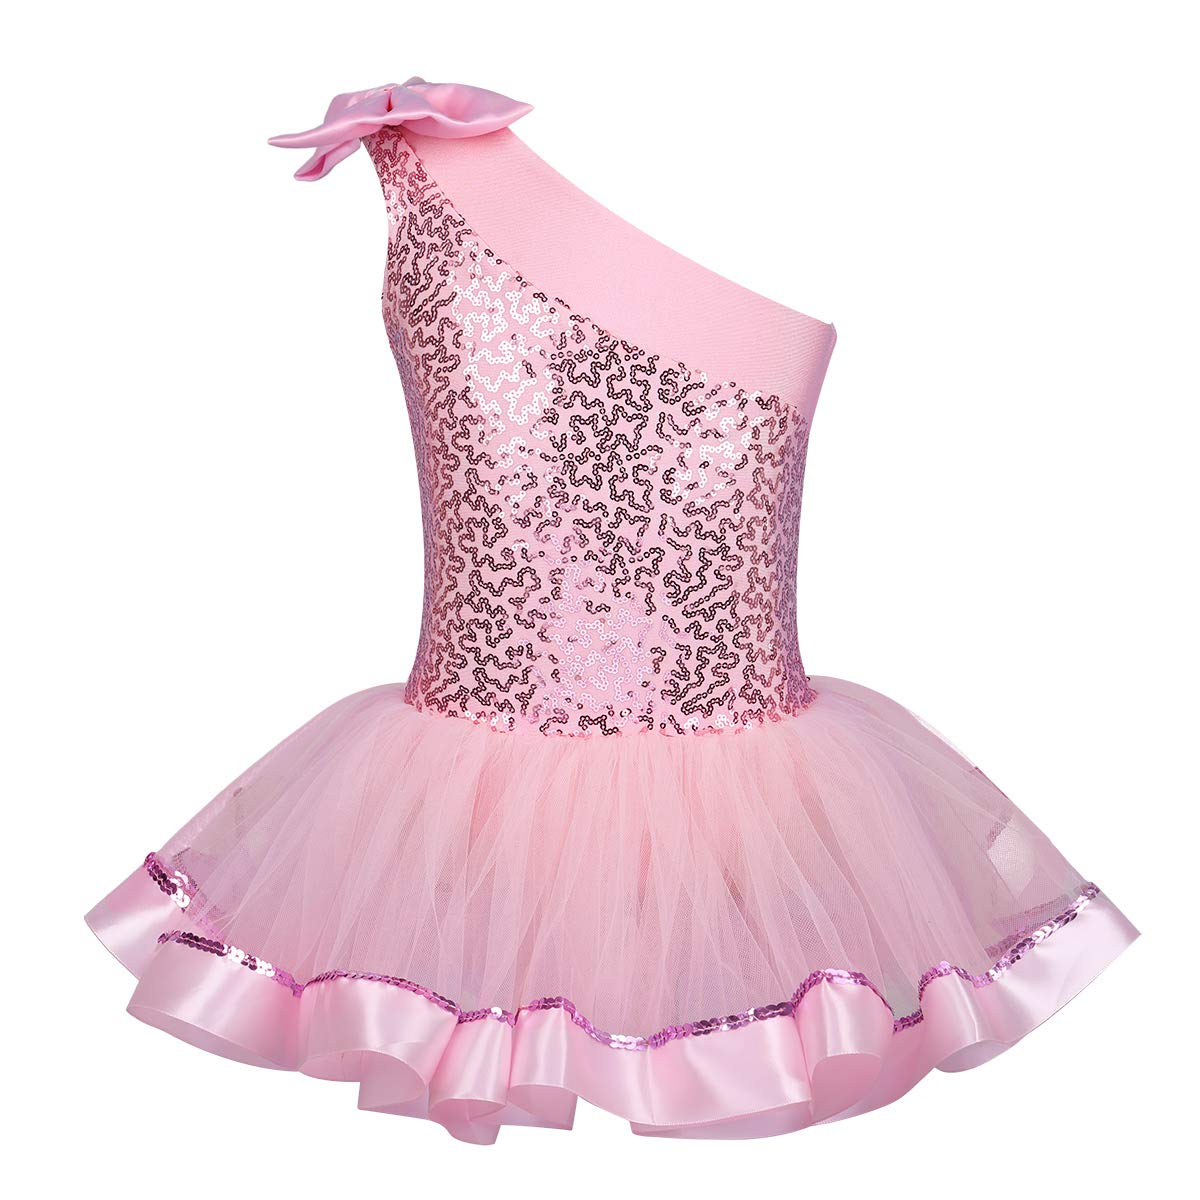 IEFIEL Disfraces Bailarina Ni/ña Maillot Ballet Lentejuelas Maillot Gimnasia Artistica Un Hombro Descubierto Bowknot Vestido de Patinaje Art/ístico Ni/ña